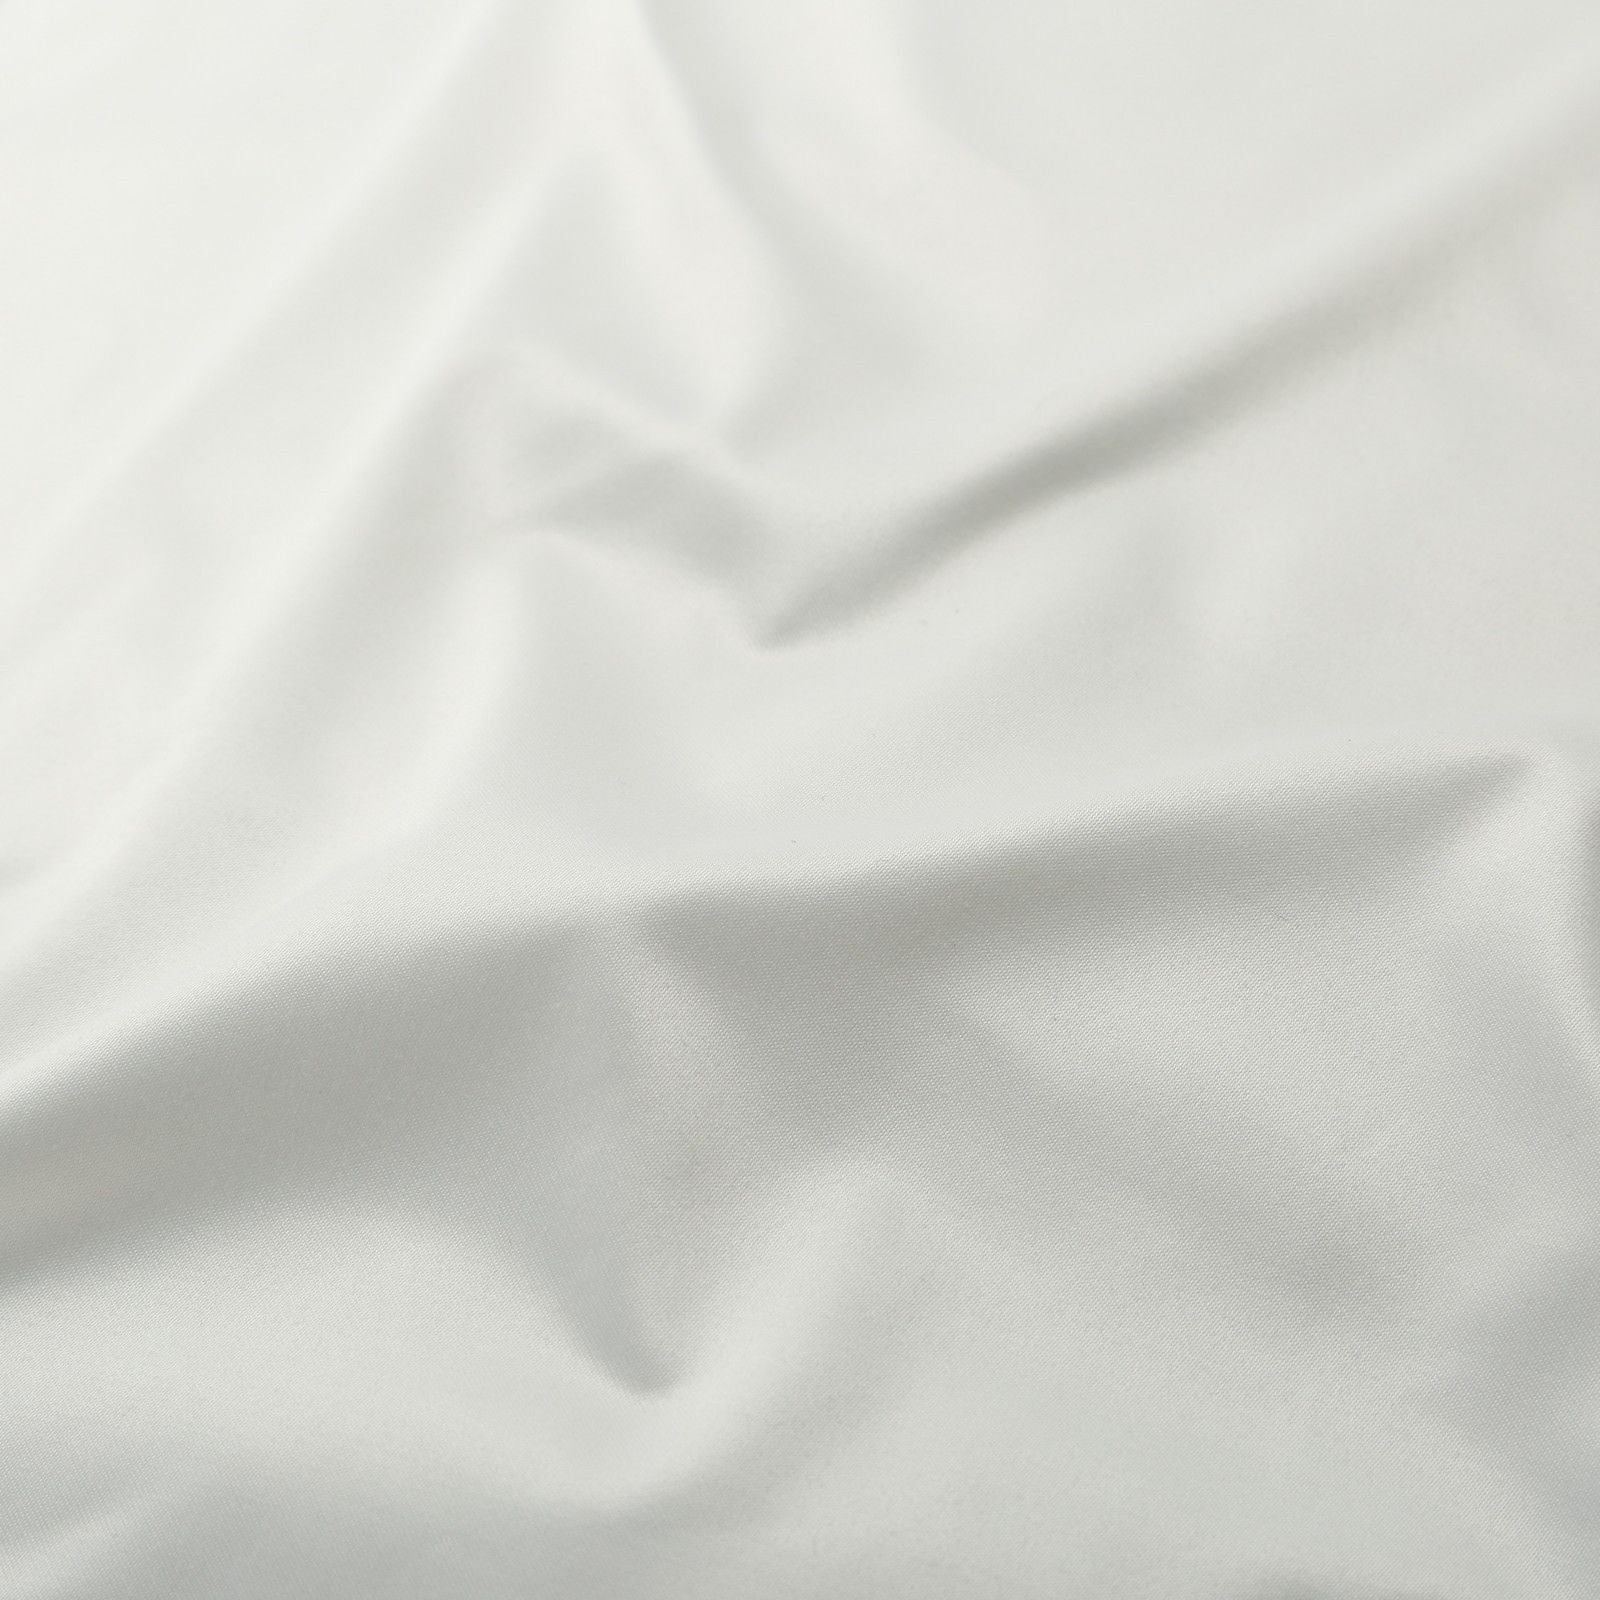 Cuscini a rullo misura king 6FT SIBERIANA piuma piuma piuma d' OCA gravidanza maternità d98c96